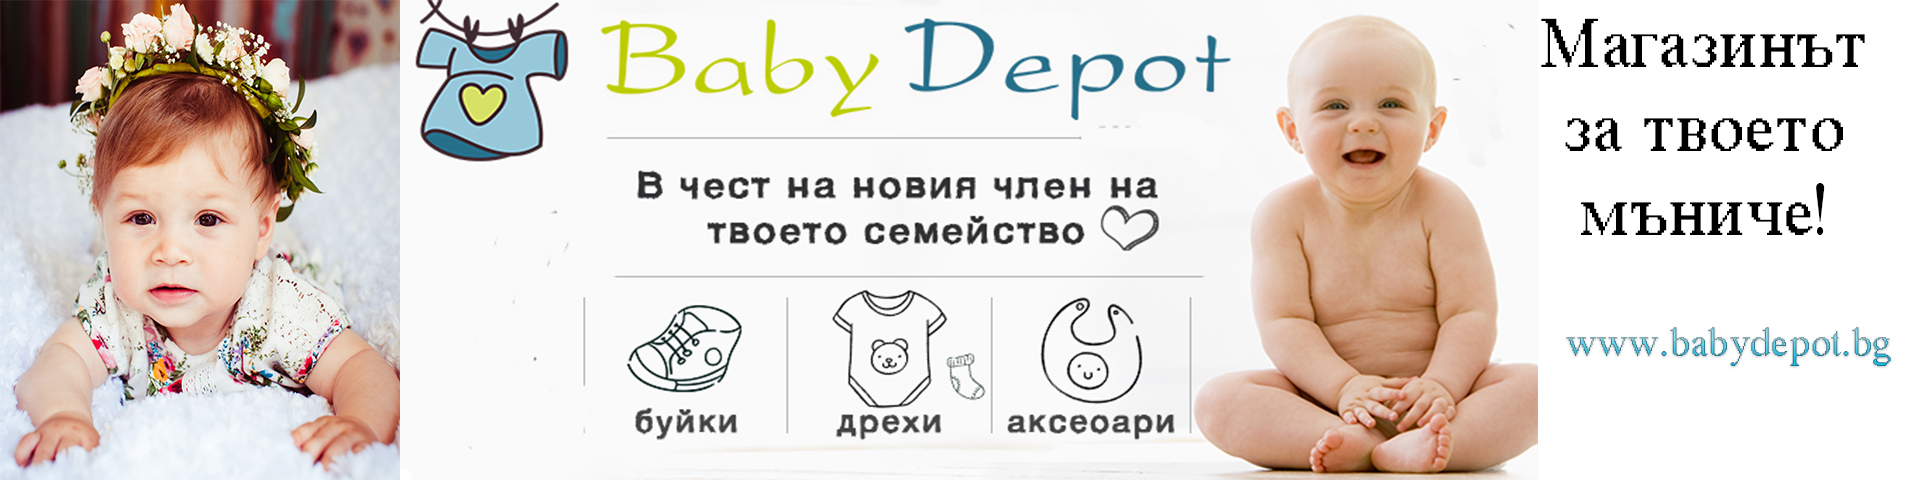 babydepot